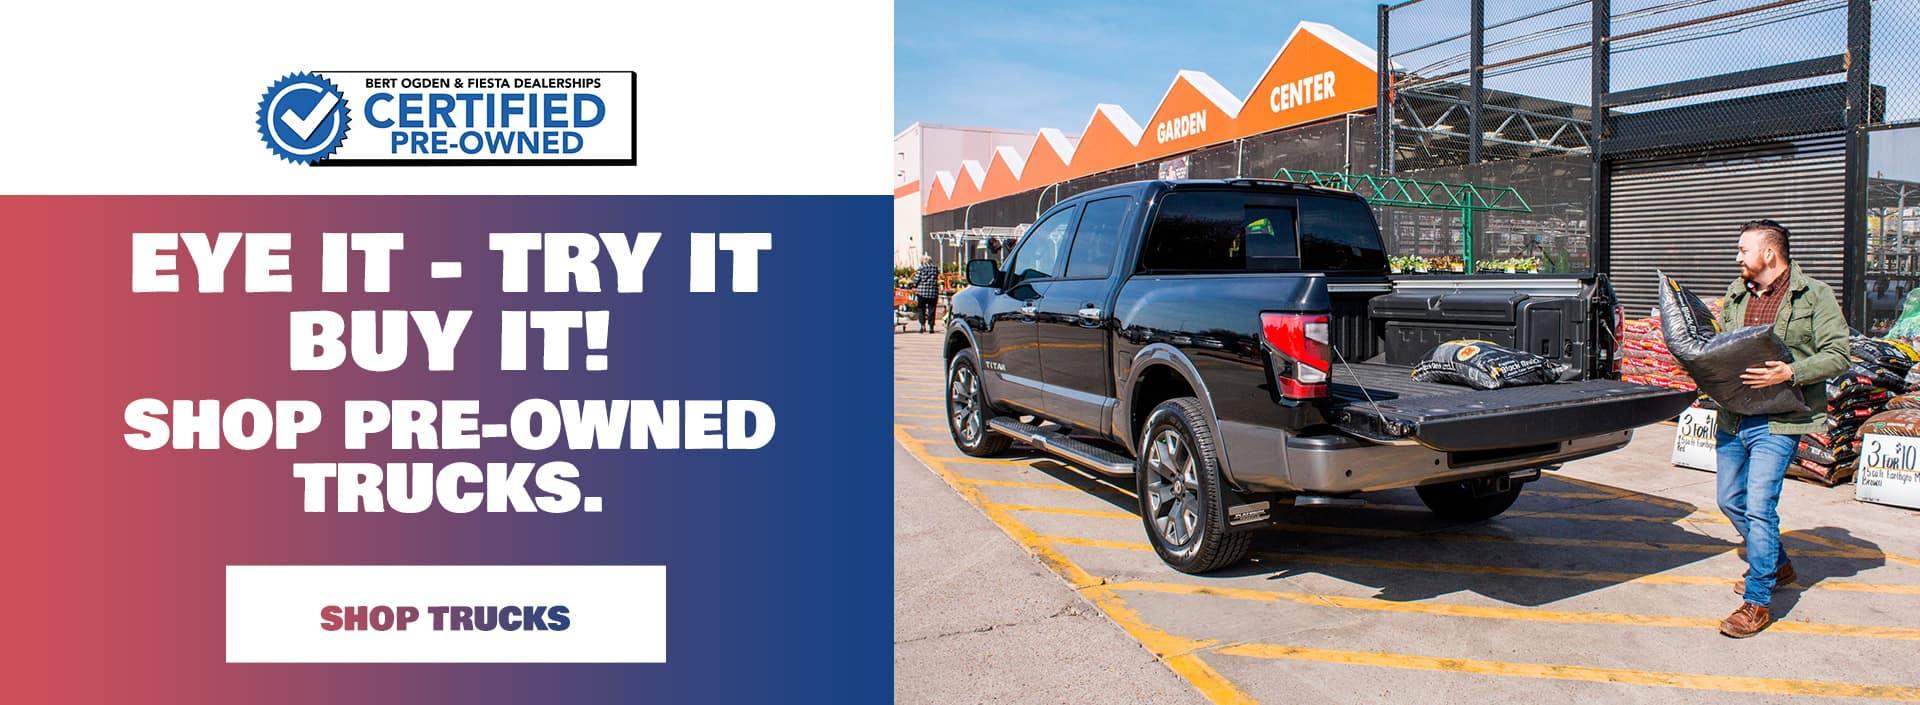 Shop Pre-owned Trucks | Mercedes, TX